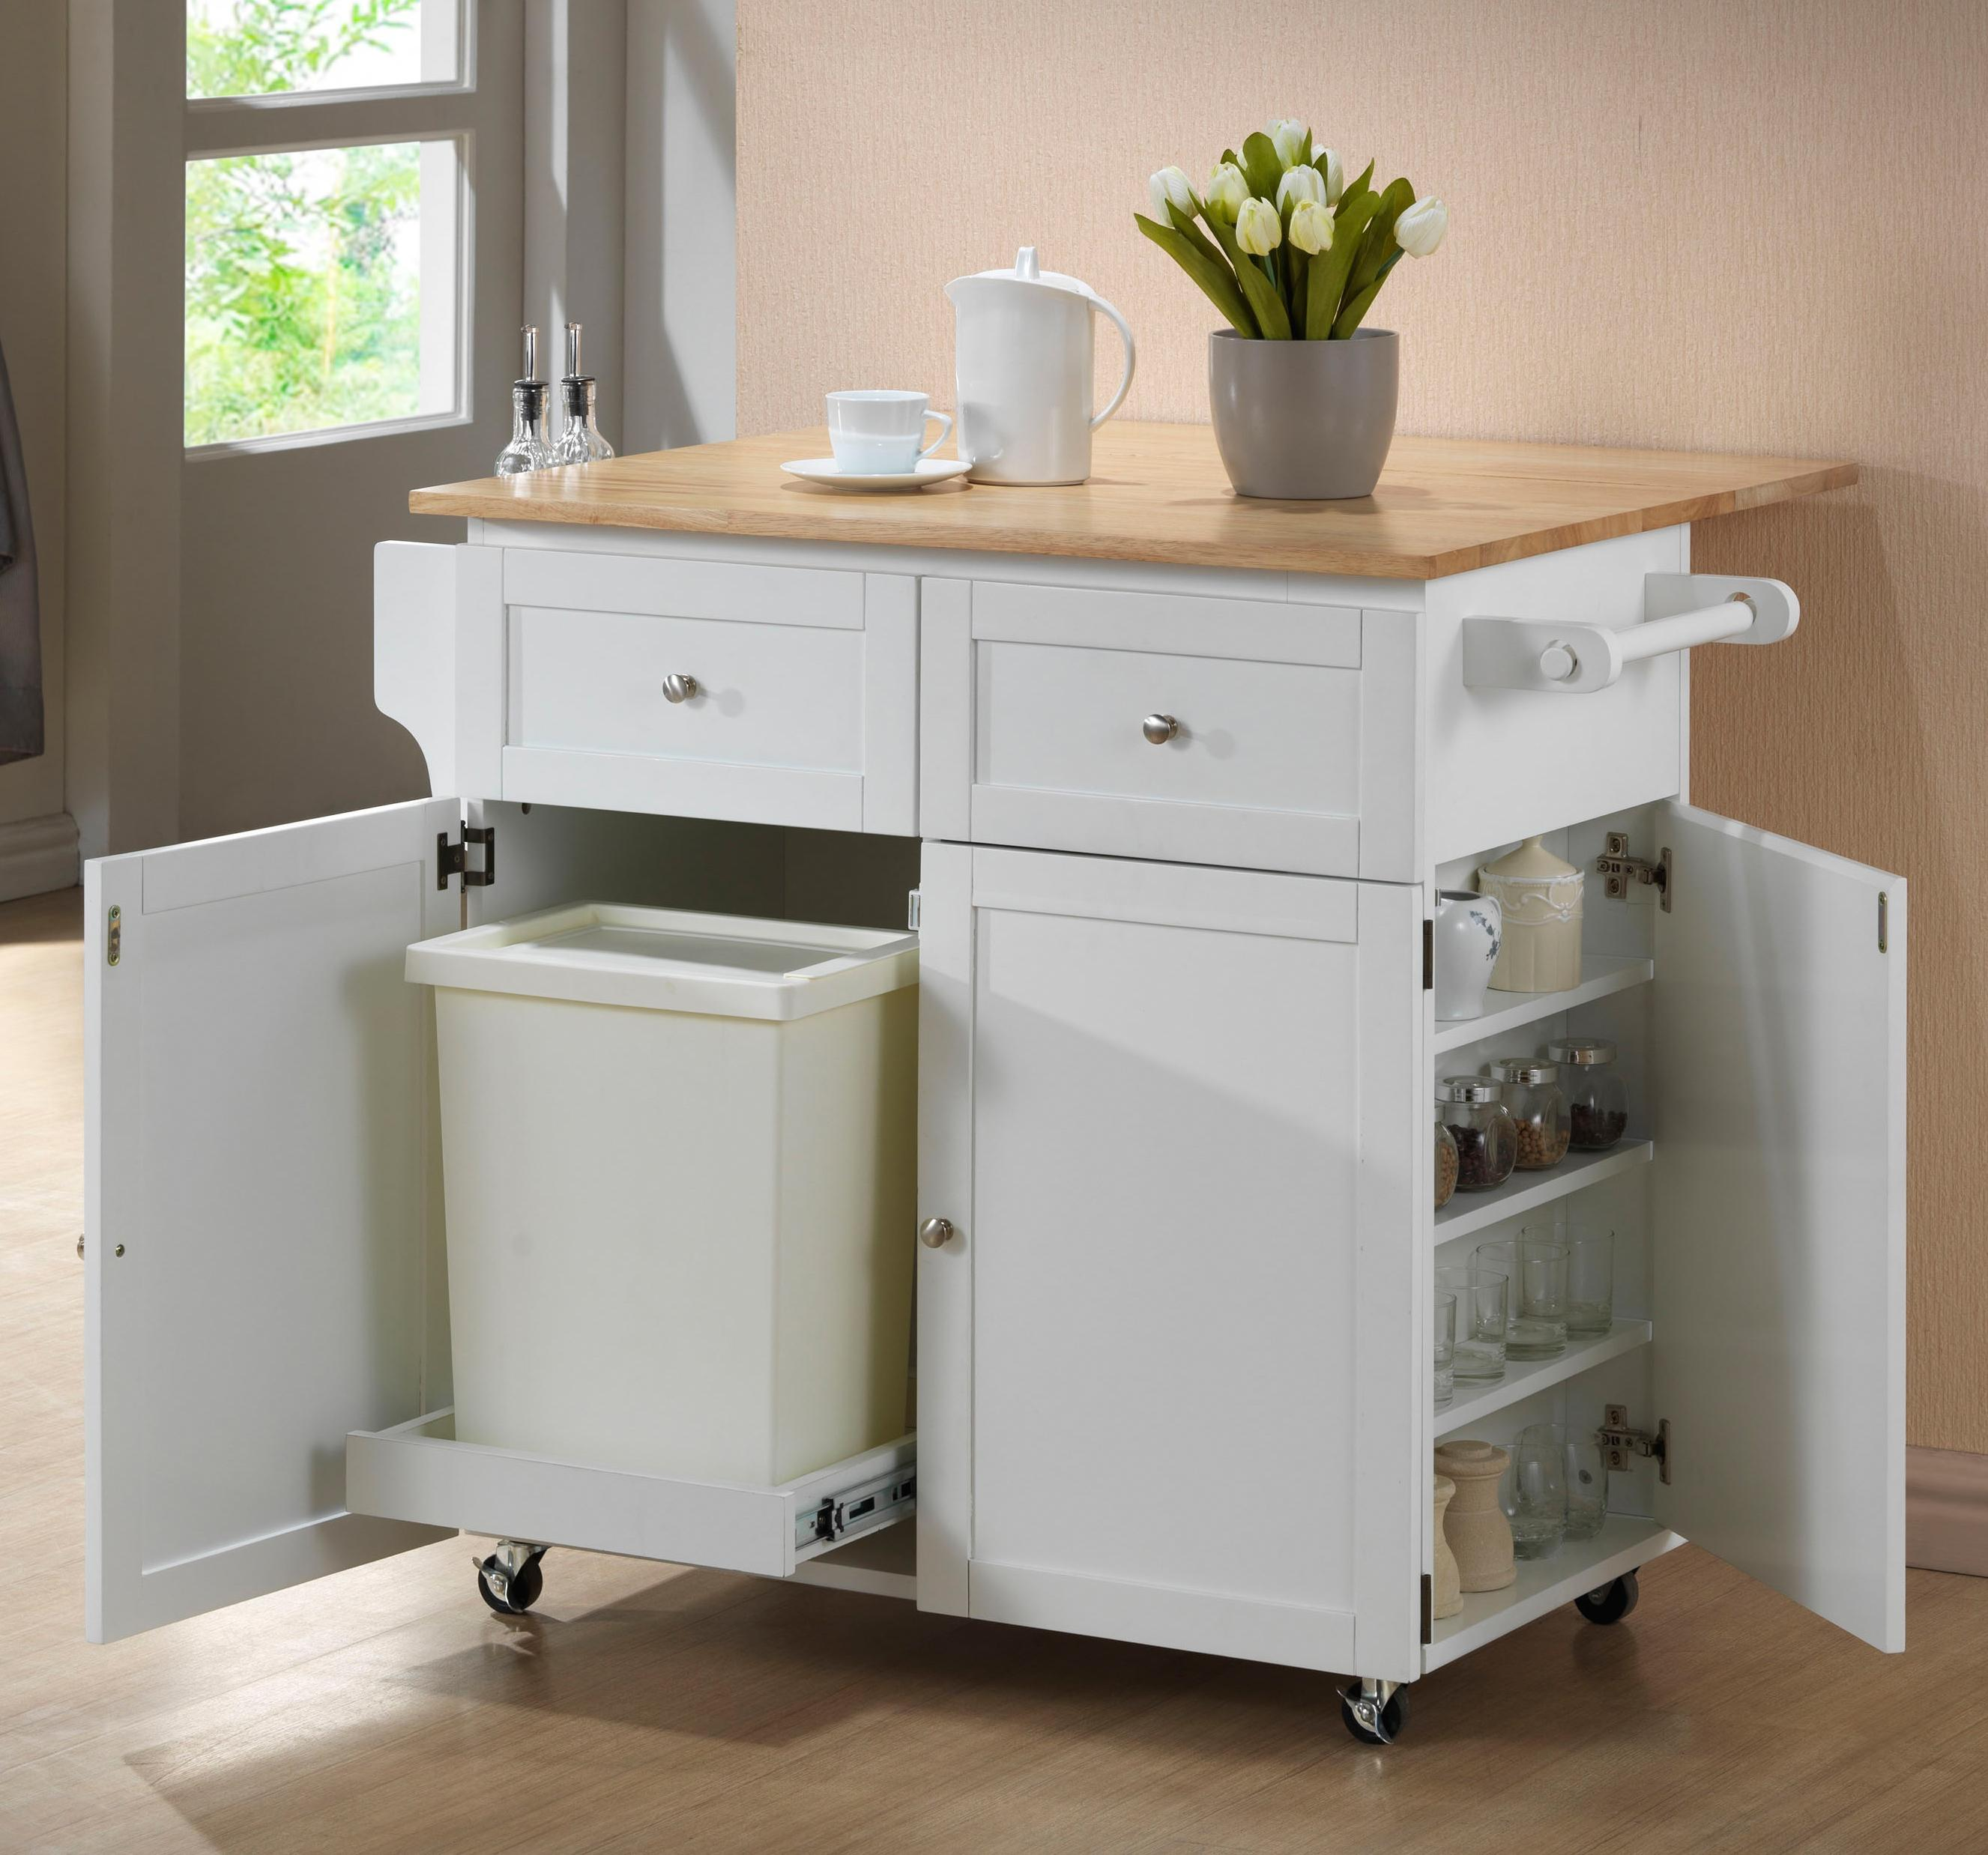 kitchen cart table server coaster carts 900558 w leaf trash compartment